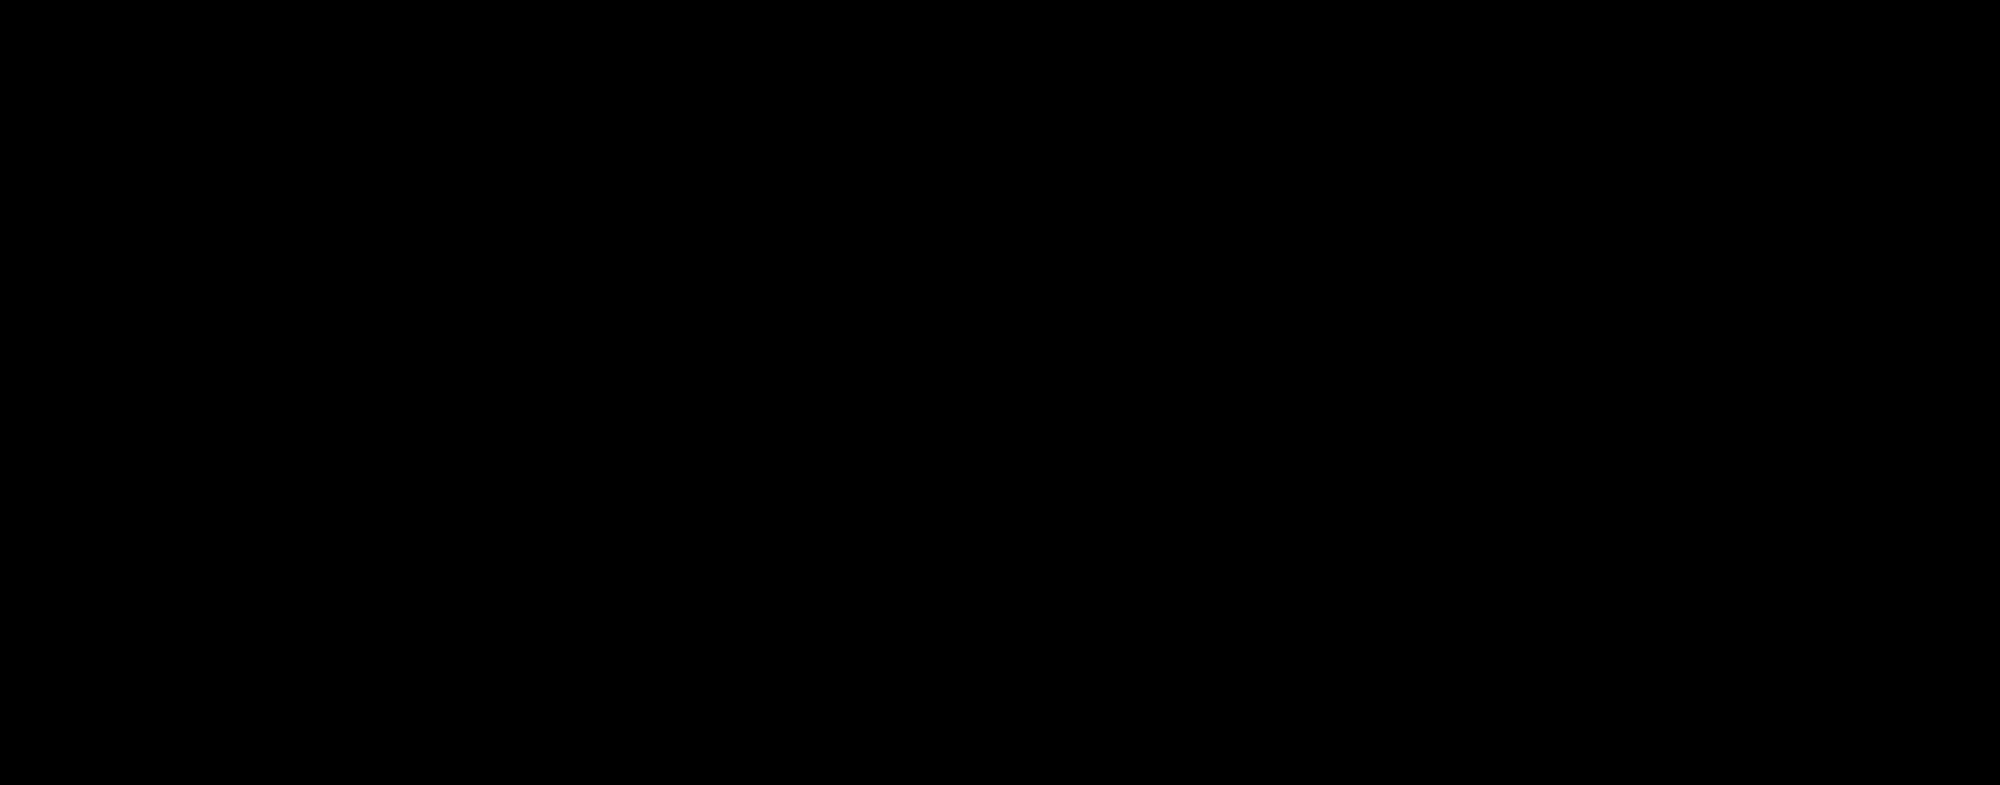 Image Result For Fallout Silhouette Fallout Logo Hello Games Logo Design